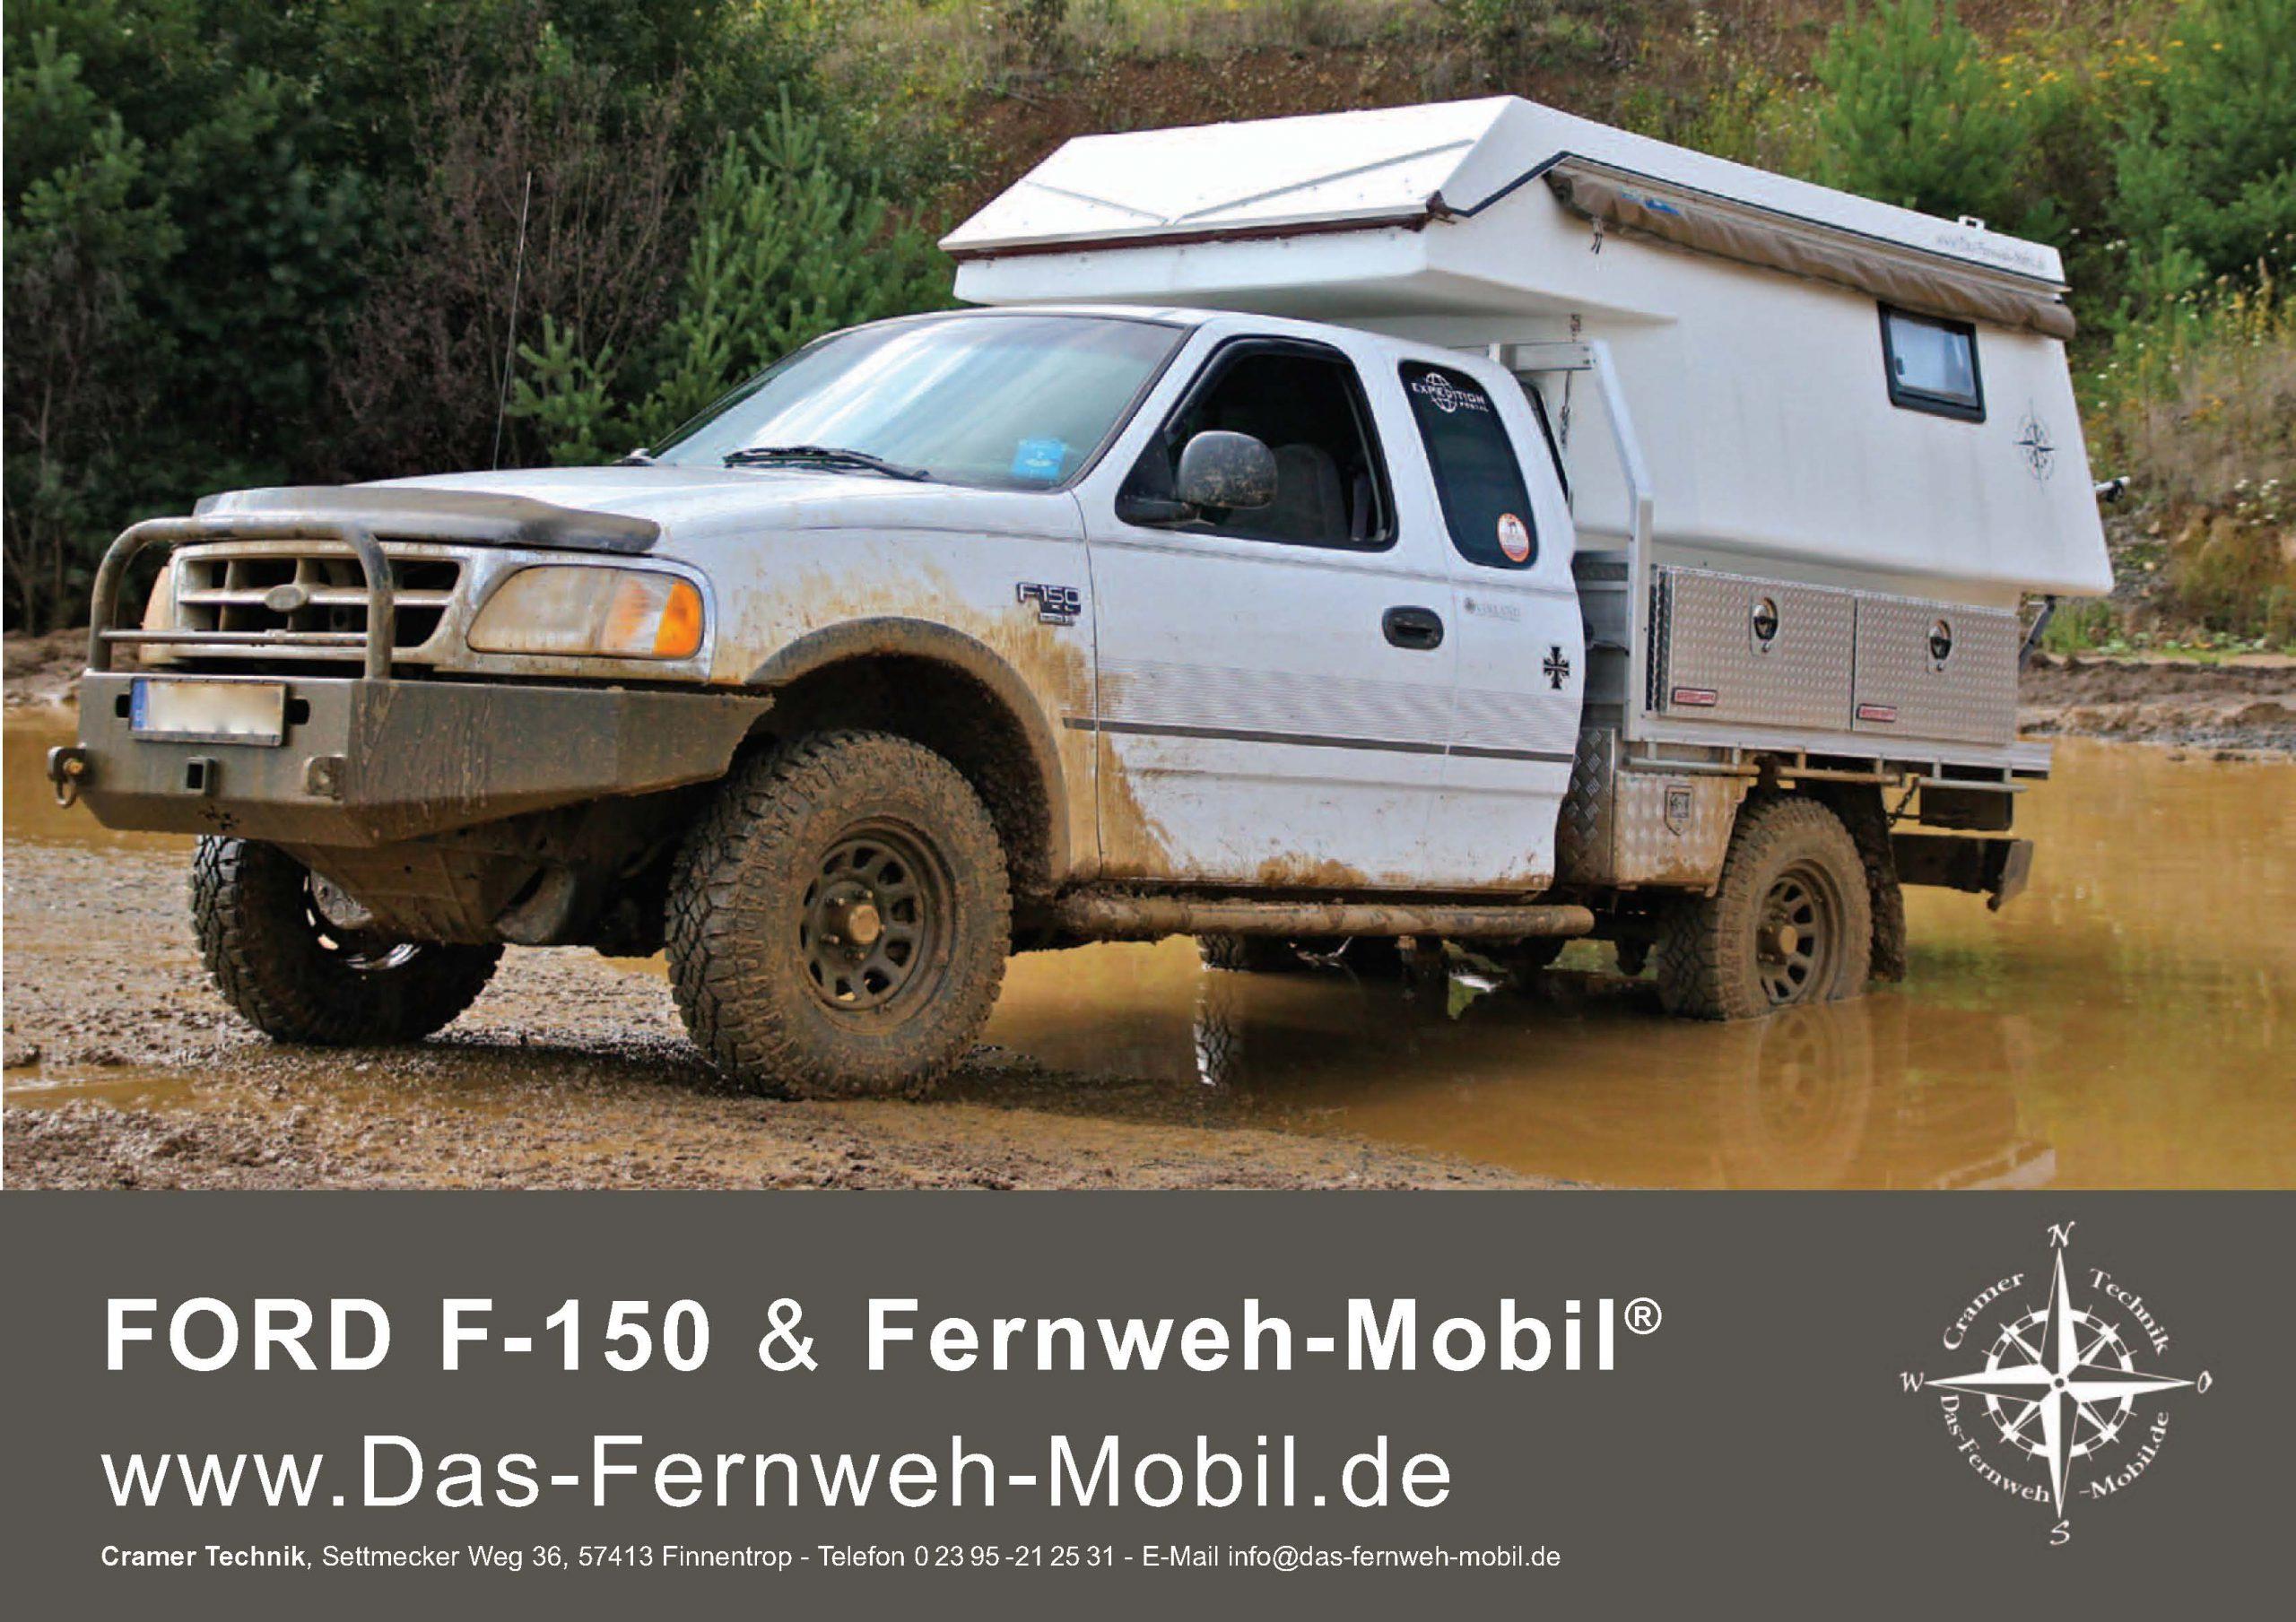 Datenblatt-Ford-F-150-102019-k_Seite_1